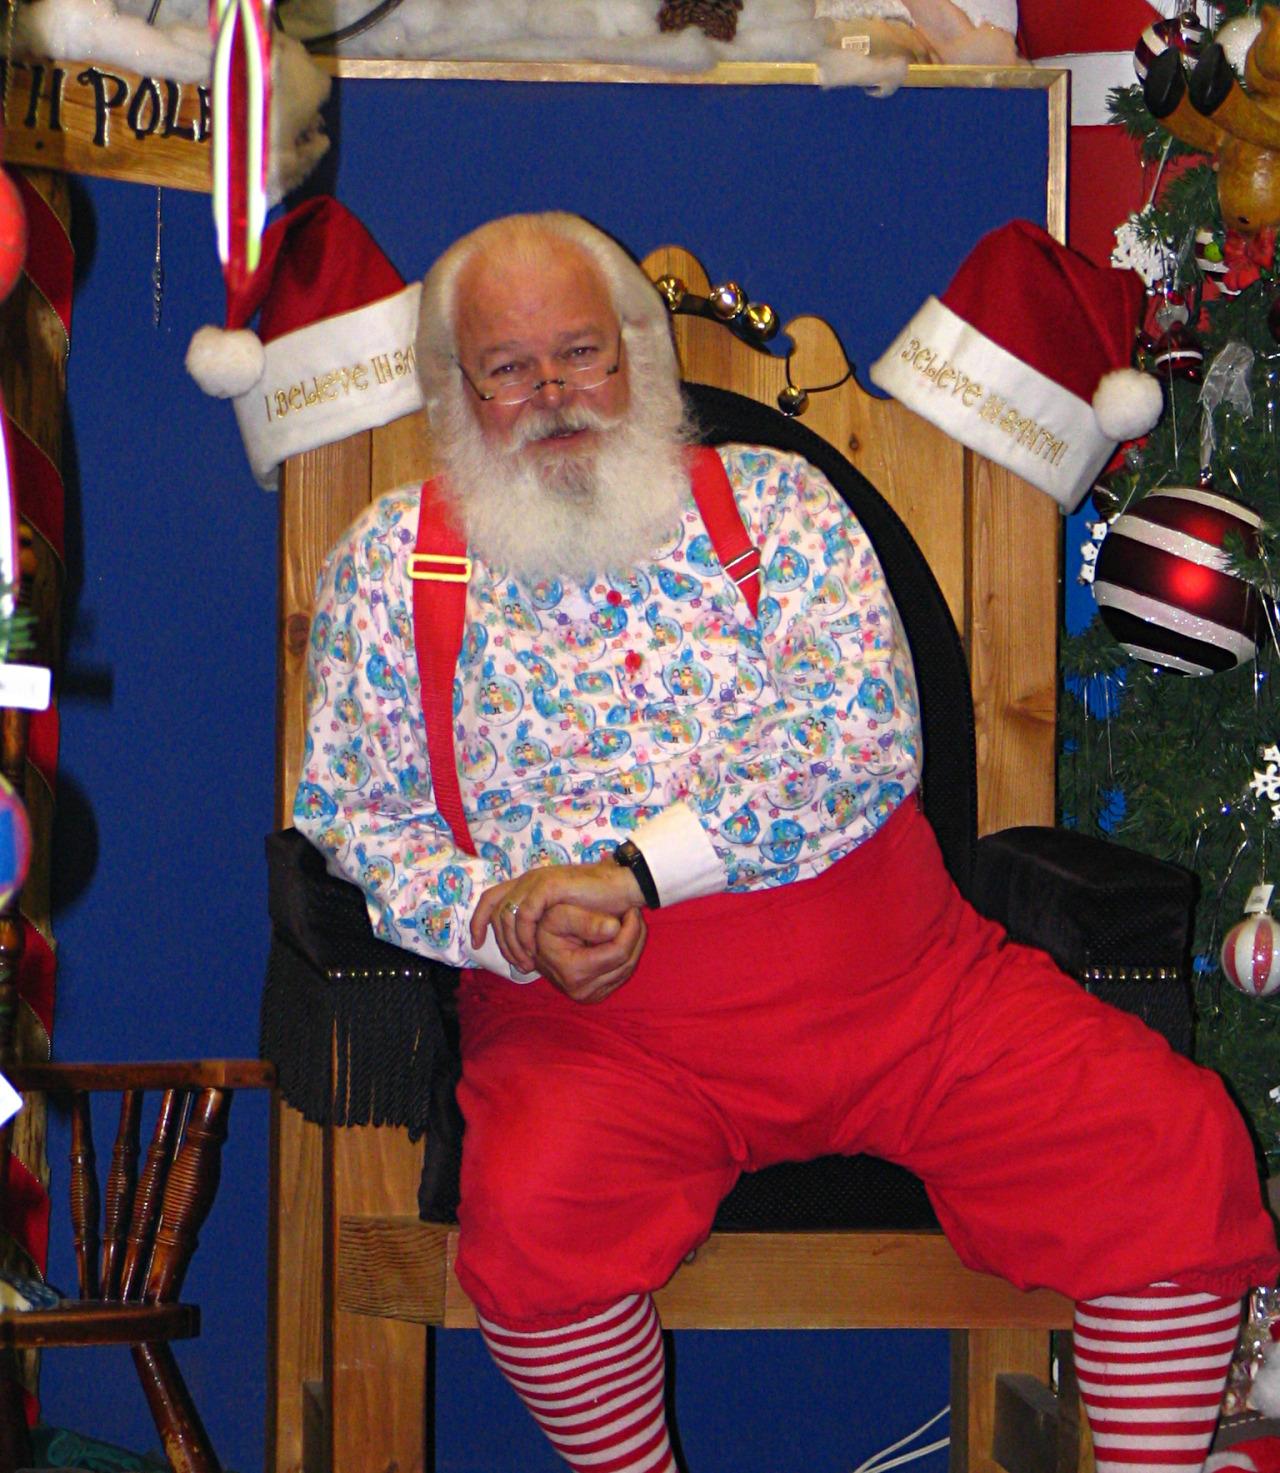 North pole alaska santa claus jpg click for details the north pole